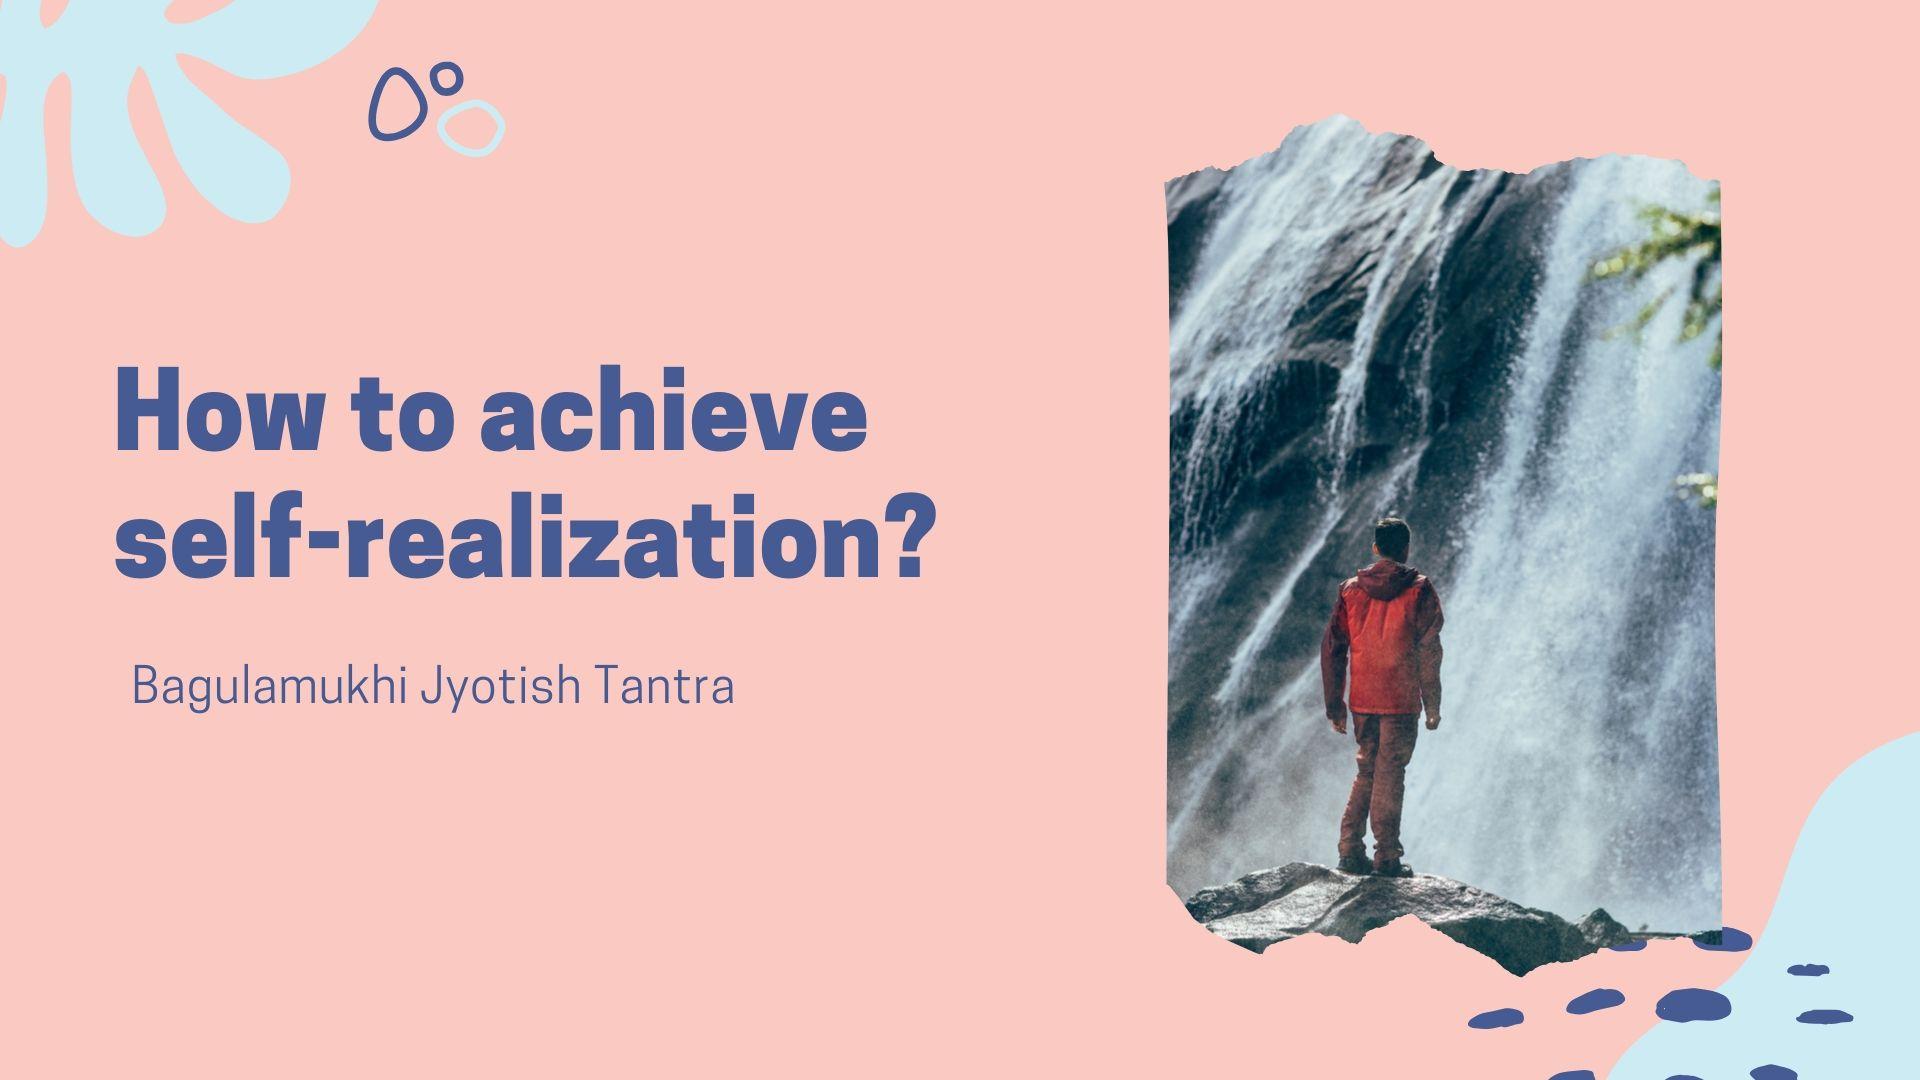 How to achieve self-realization